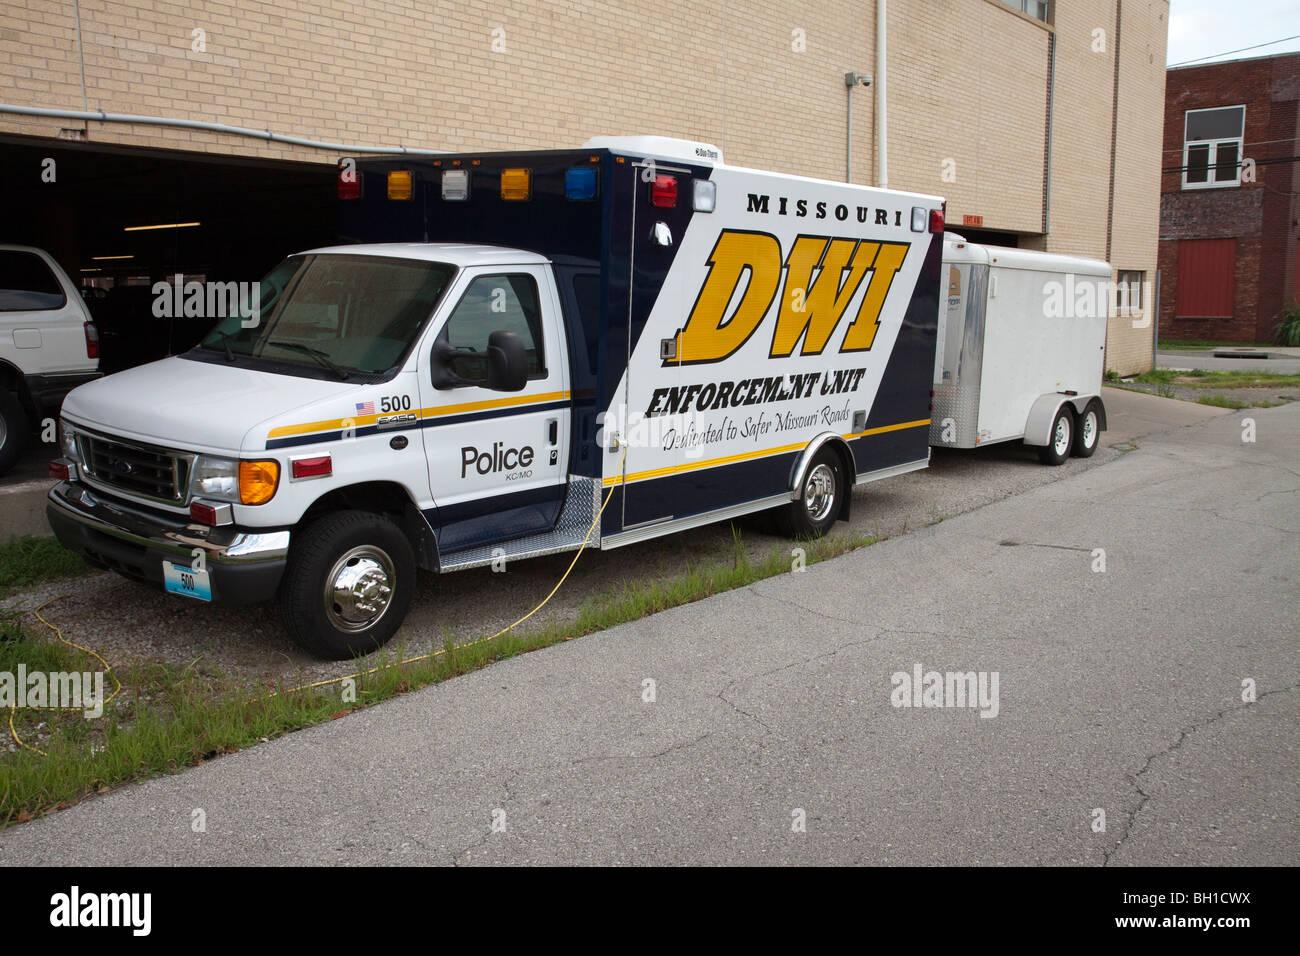 Cable Dahmer Chevrolet >> Department Of Motor Vehicles Kansas City Mo - impremedia.net